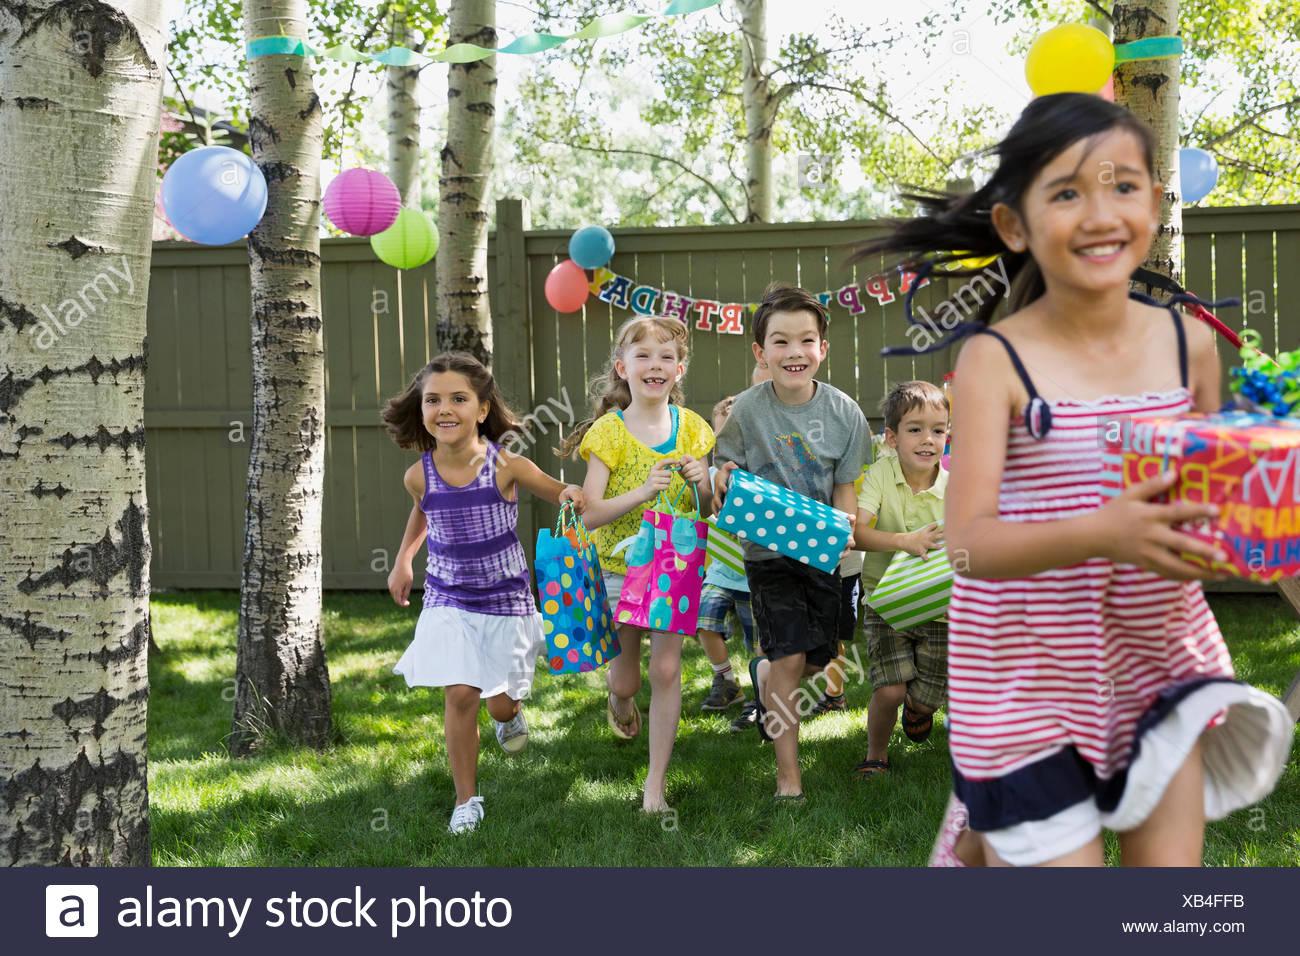 Backyard Gifts kids running with birthday gifts in backyard stock photo: 282227103